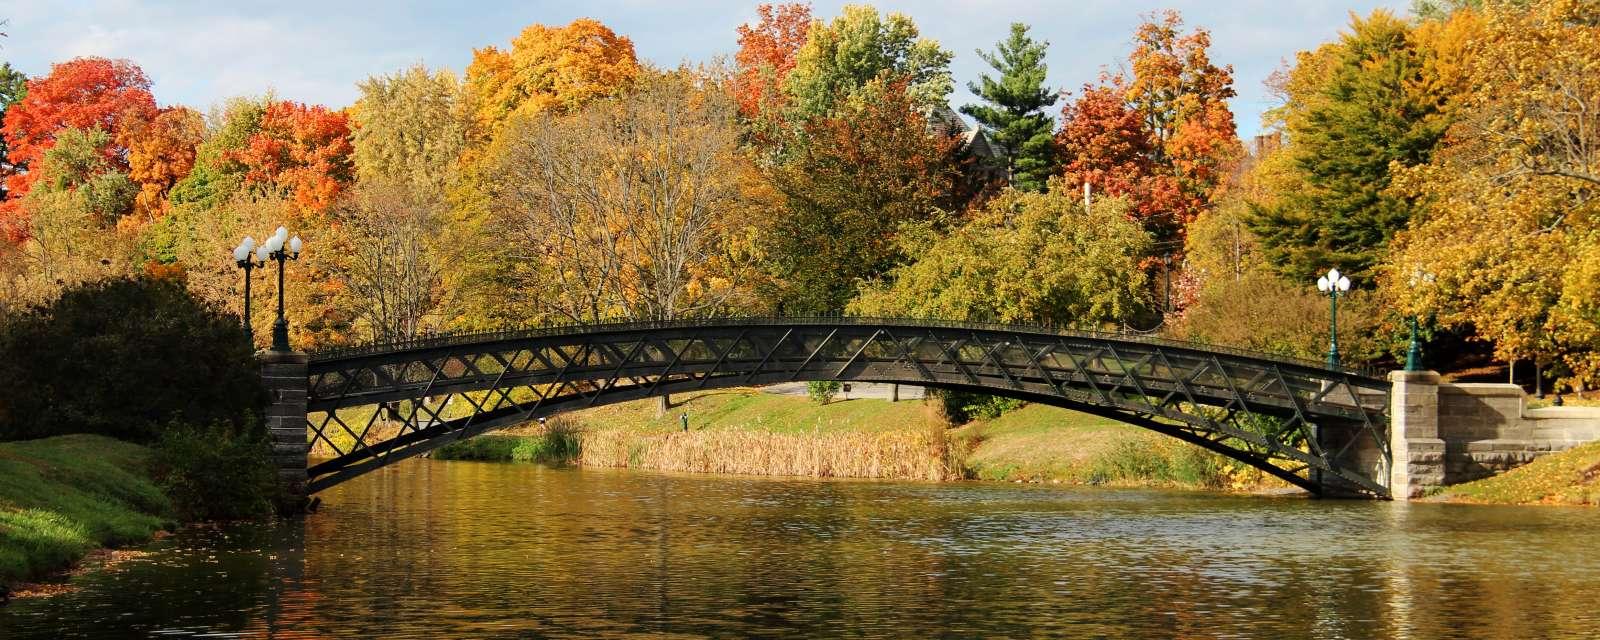 Washington Park during the Fall